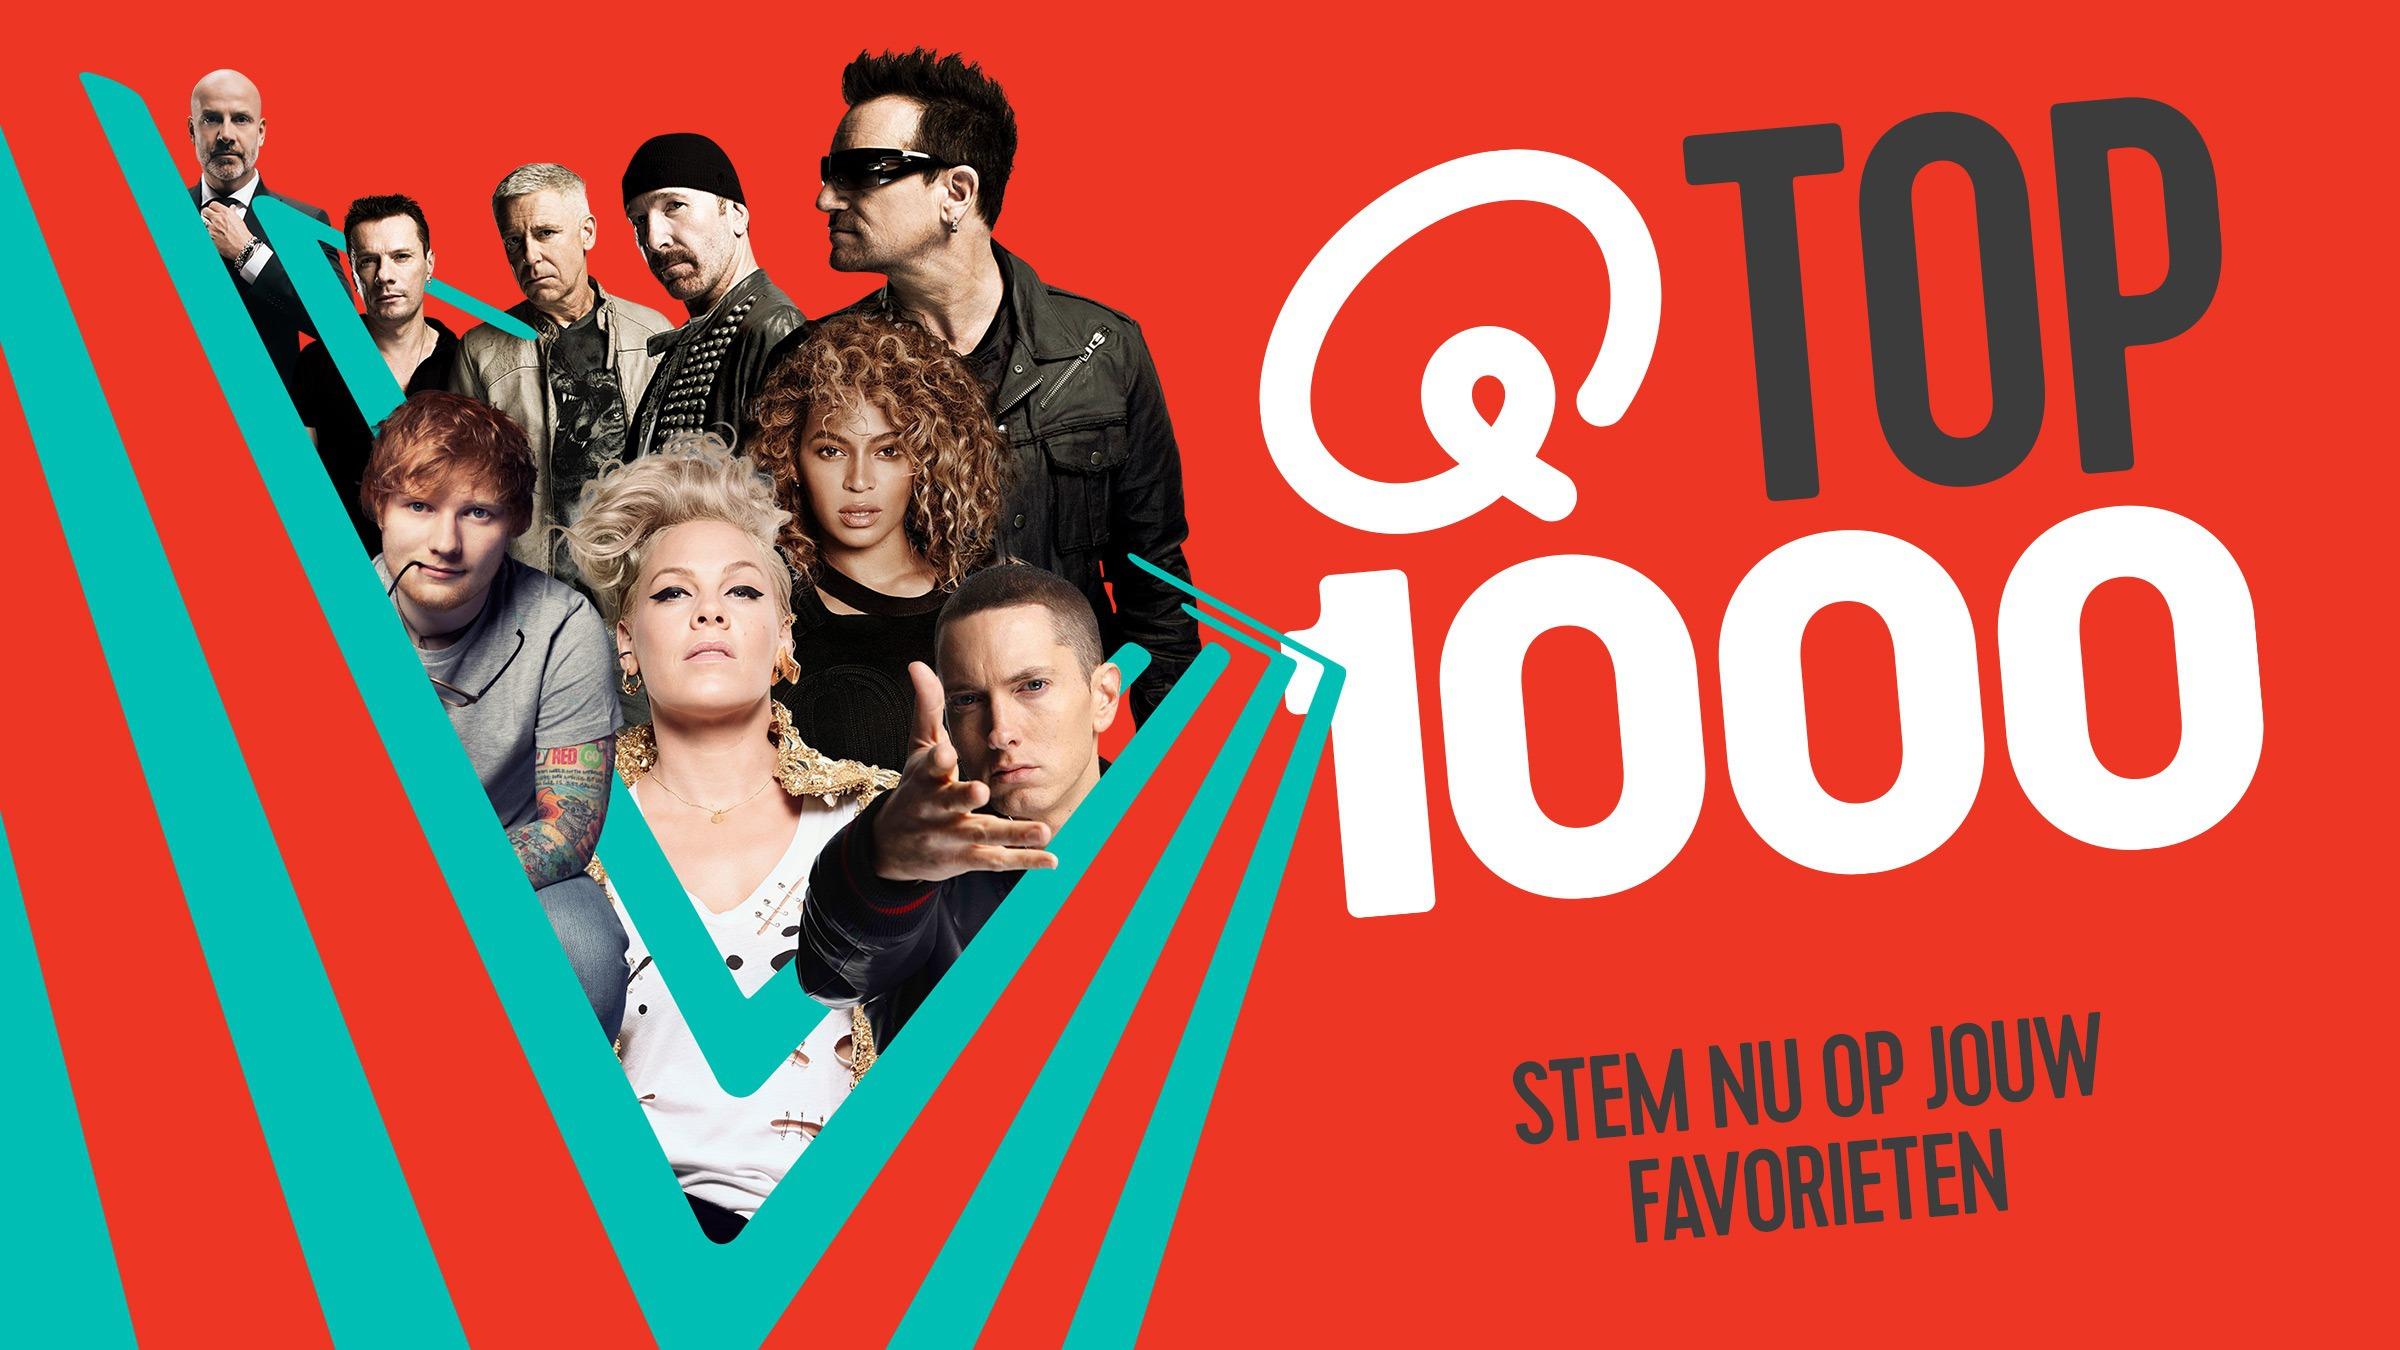 Qmusic teaser qtop1000 2018